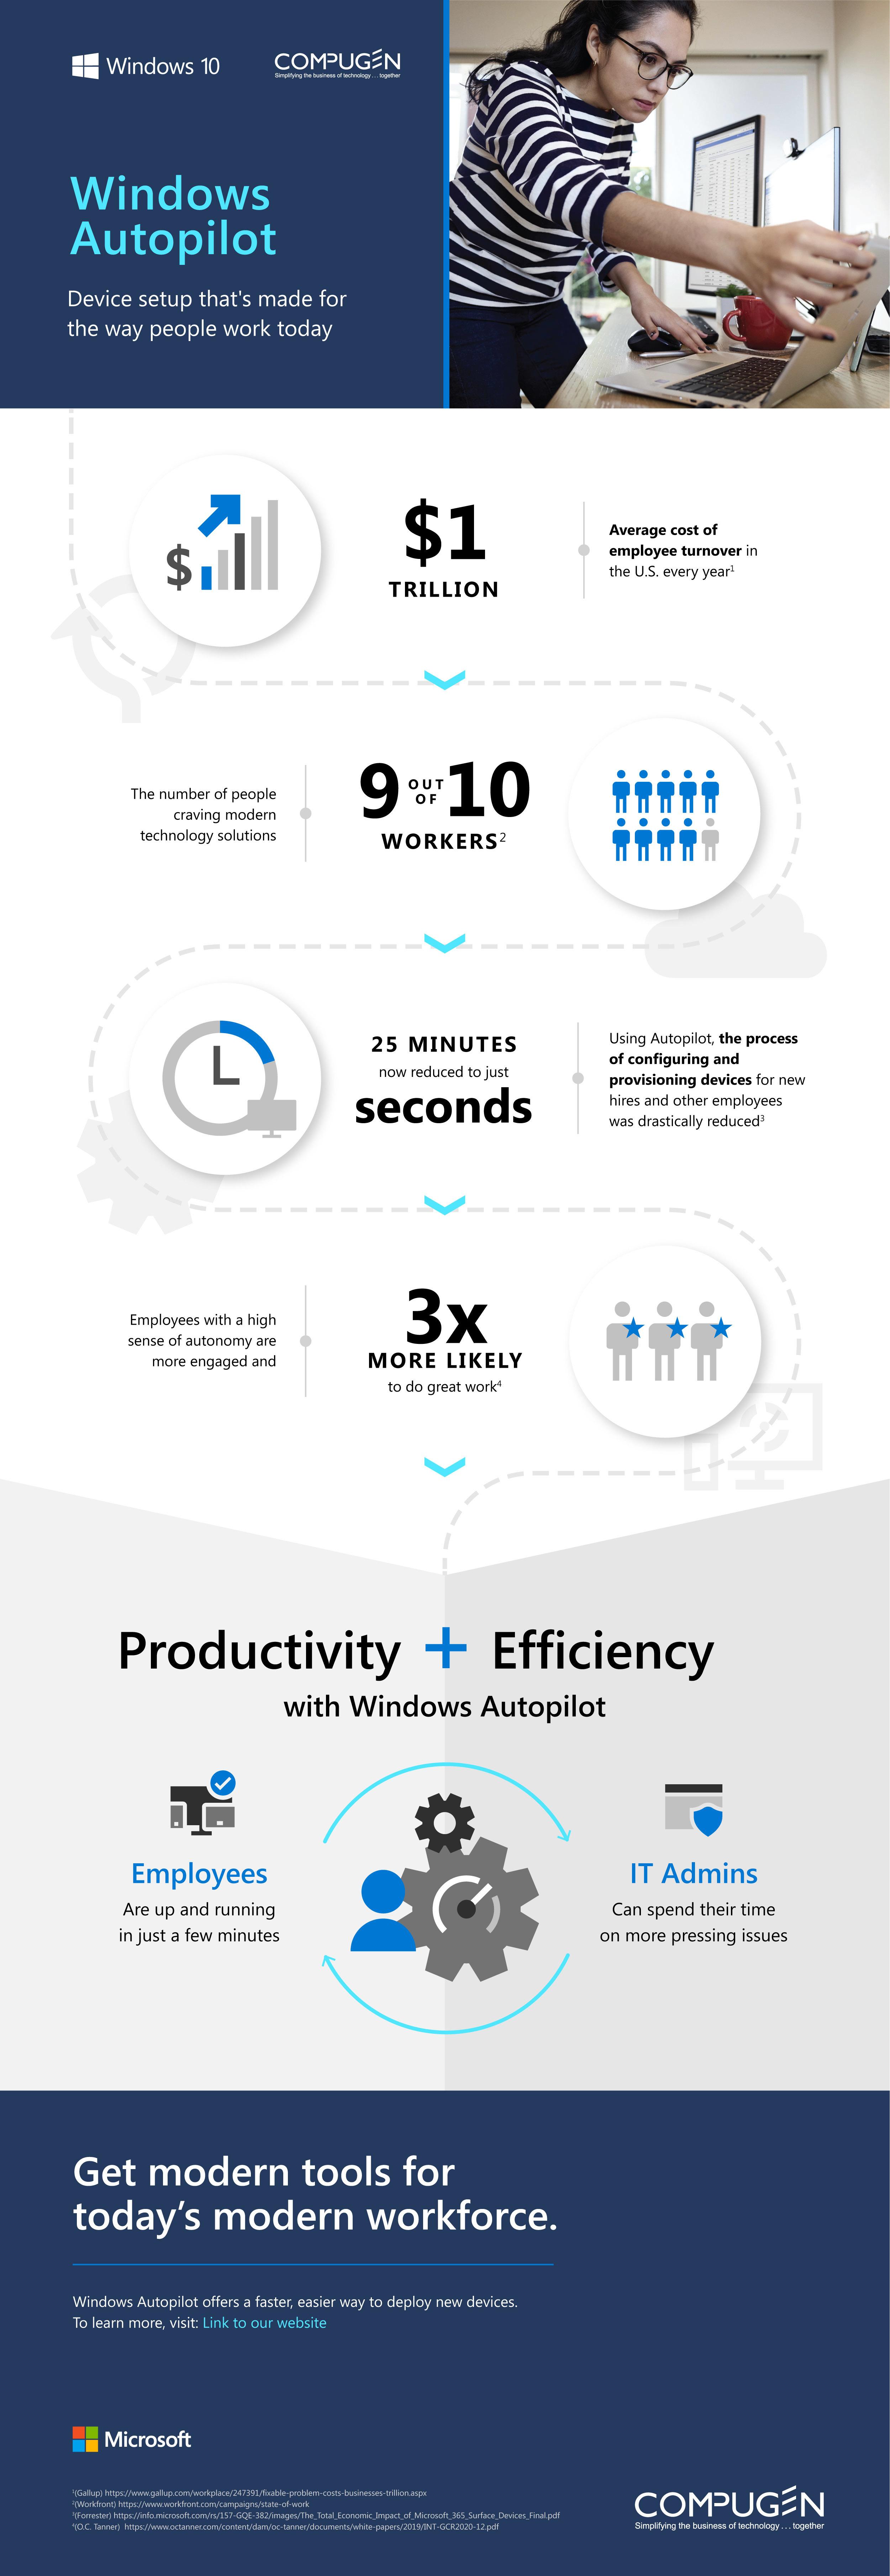 Windows 10 Autopilot Infographic